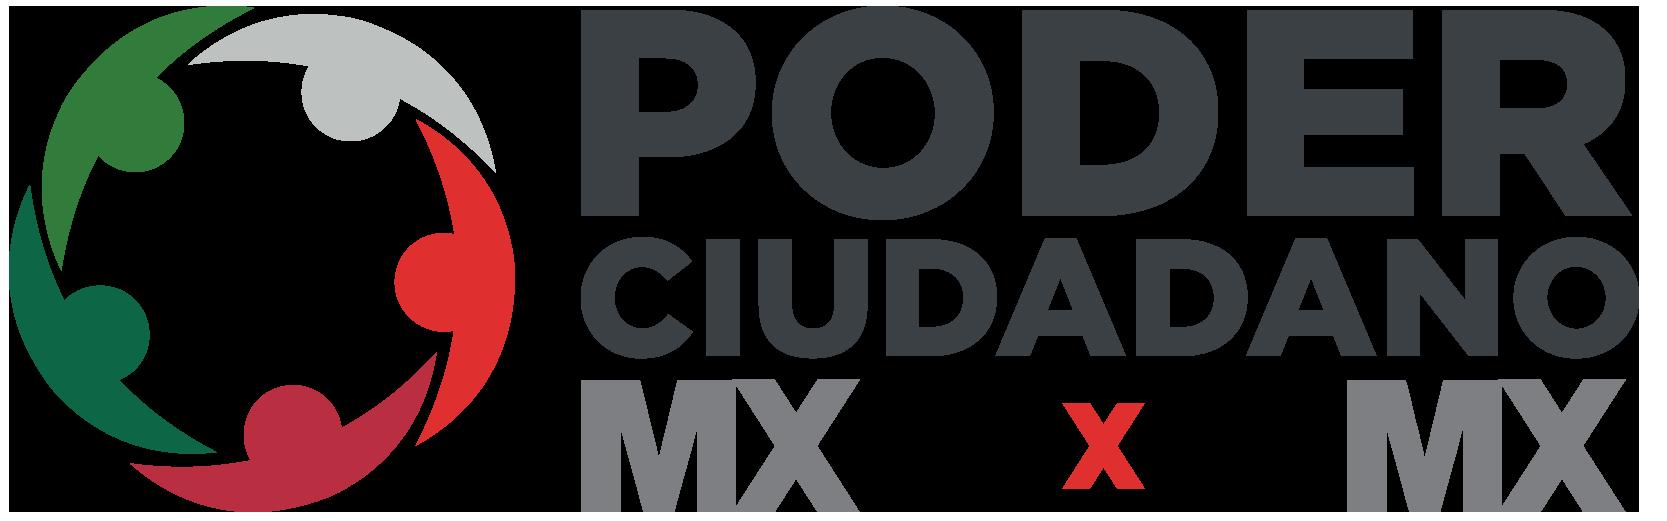 Poder ciudadano - mx x mx